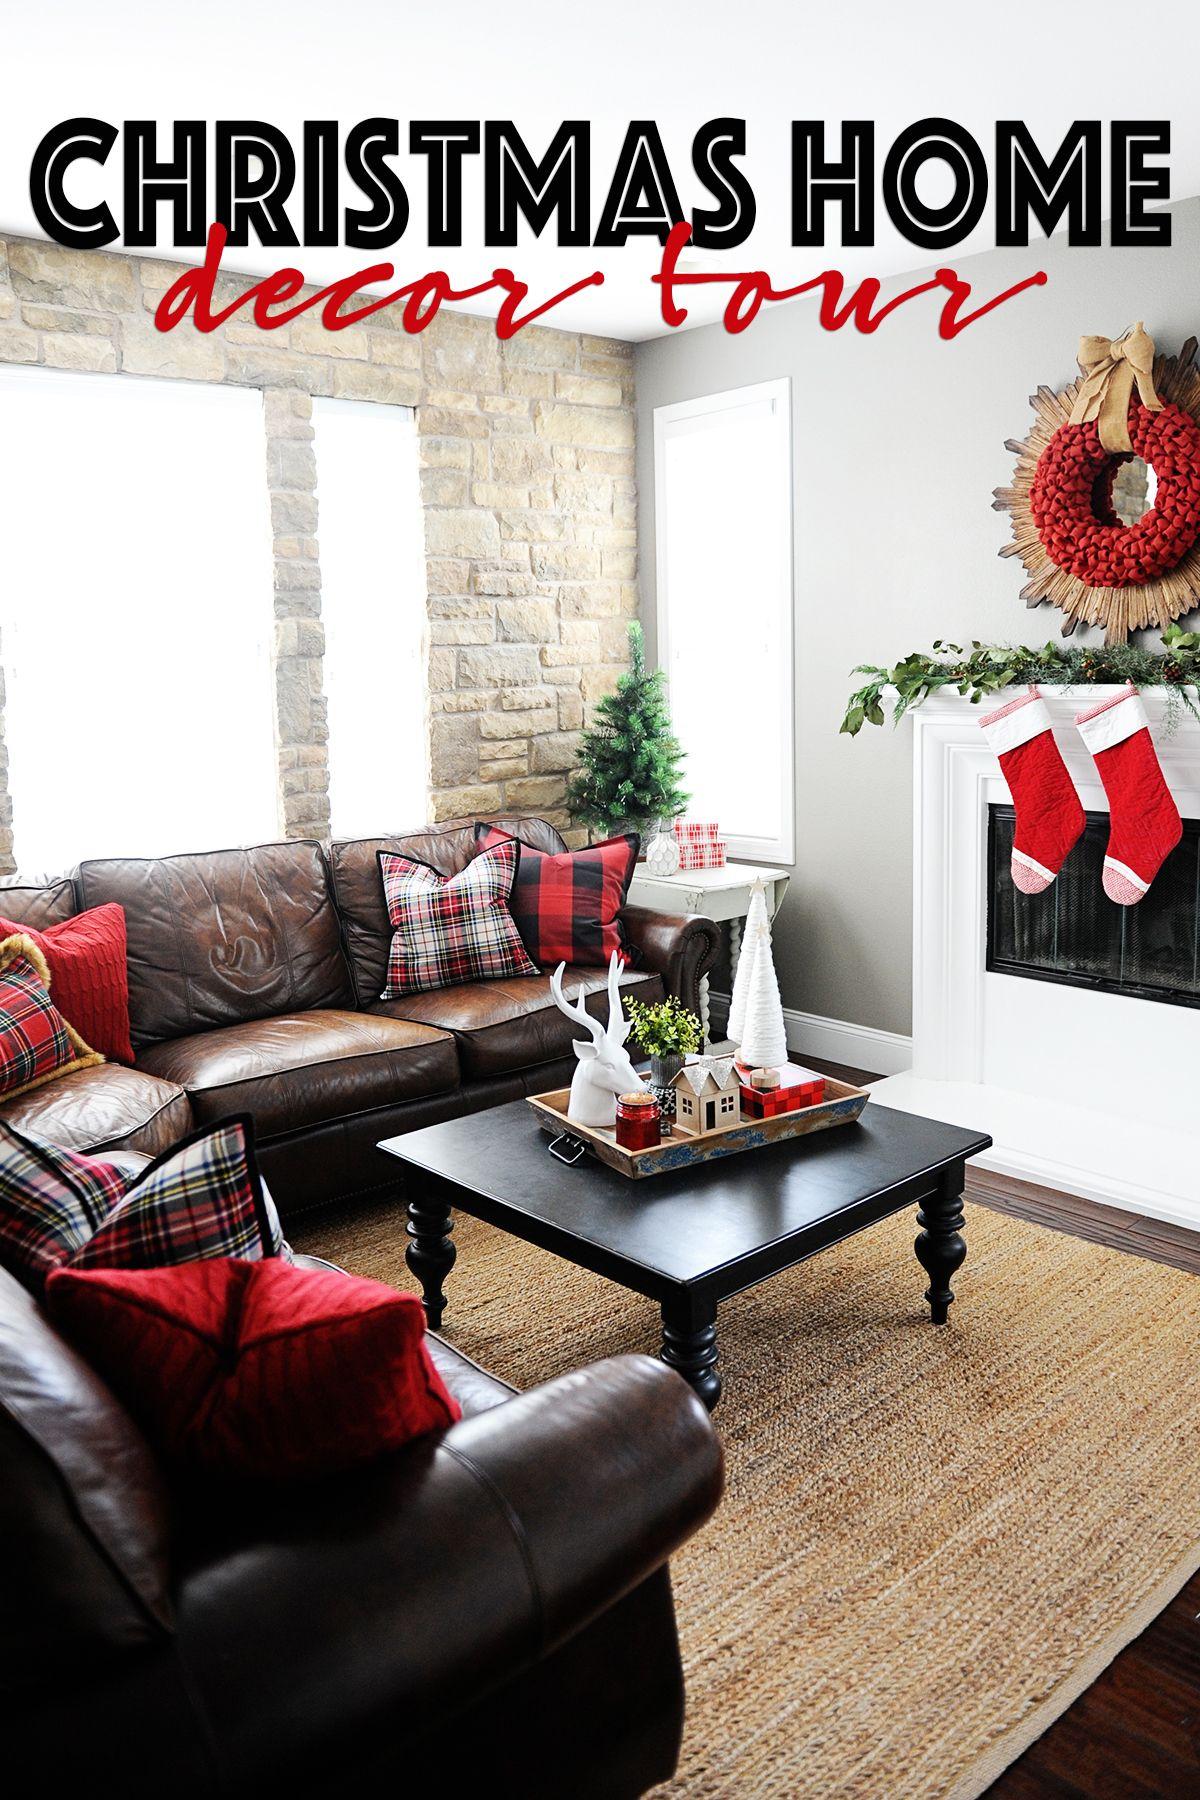 Christmas Home Decor Our Christmas Home Tour Holiday Coffee Table Decor Christmas Home Decor